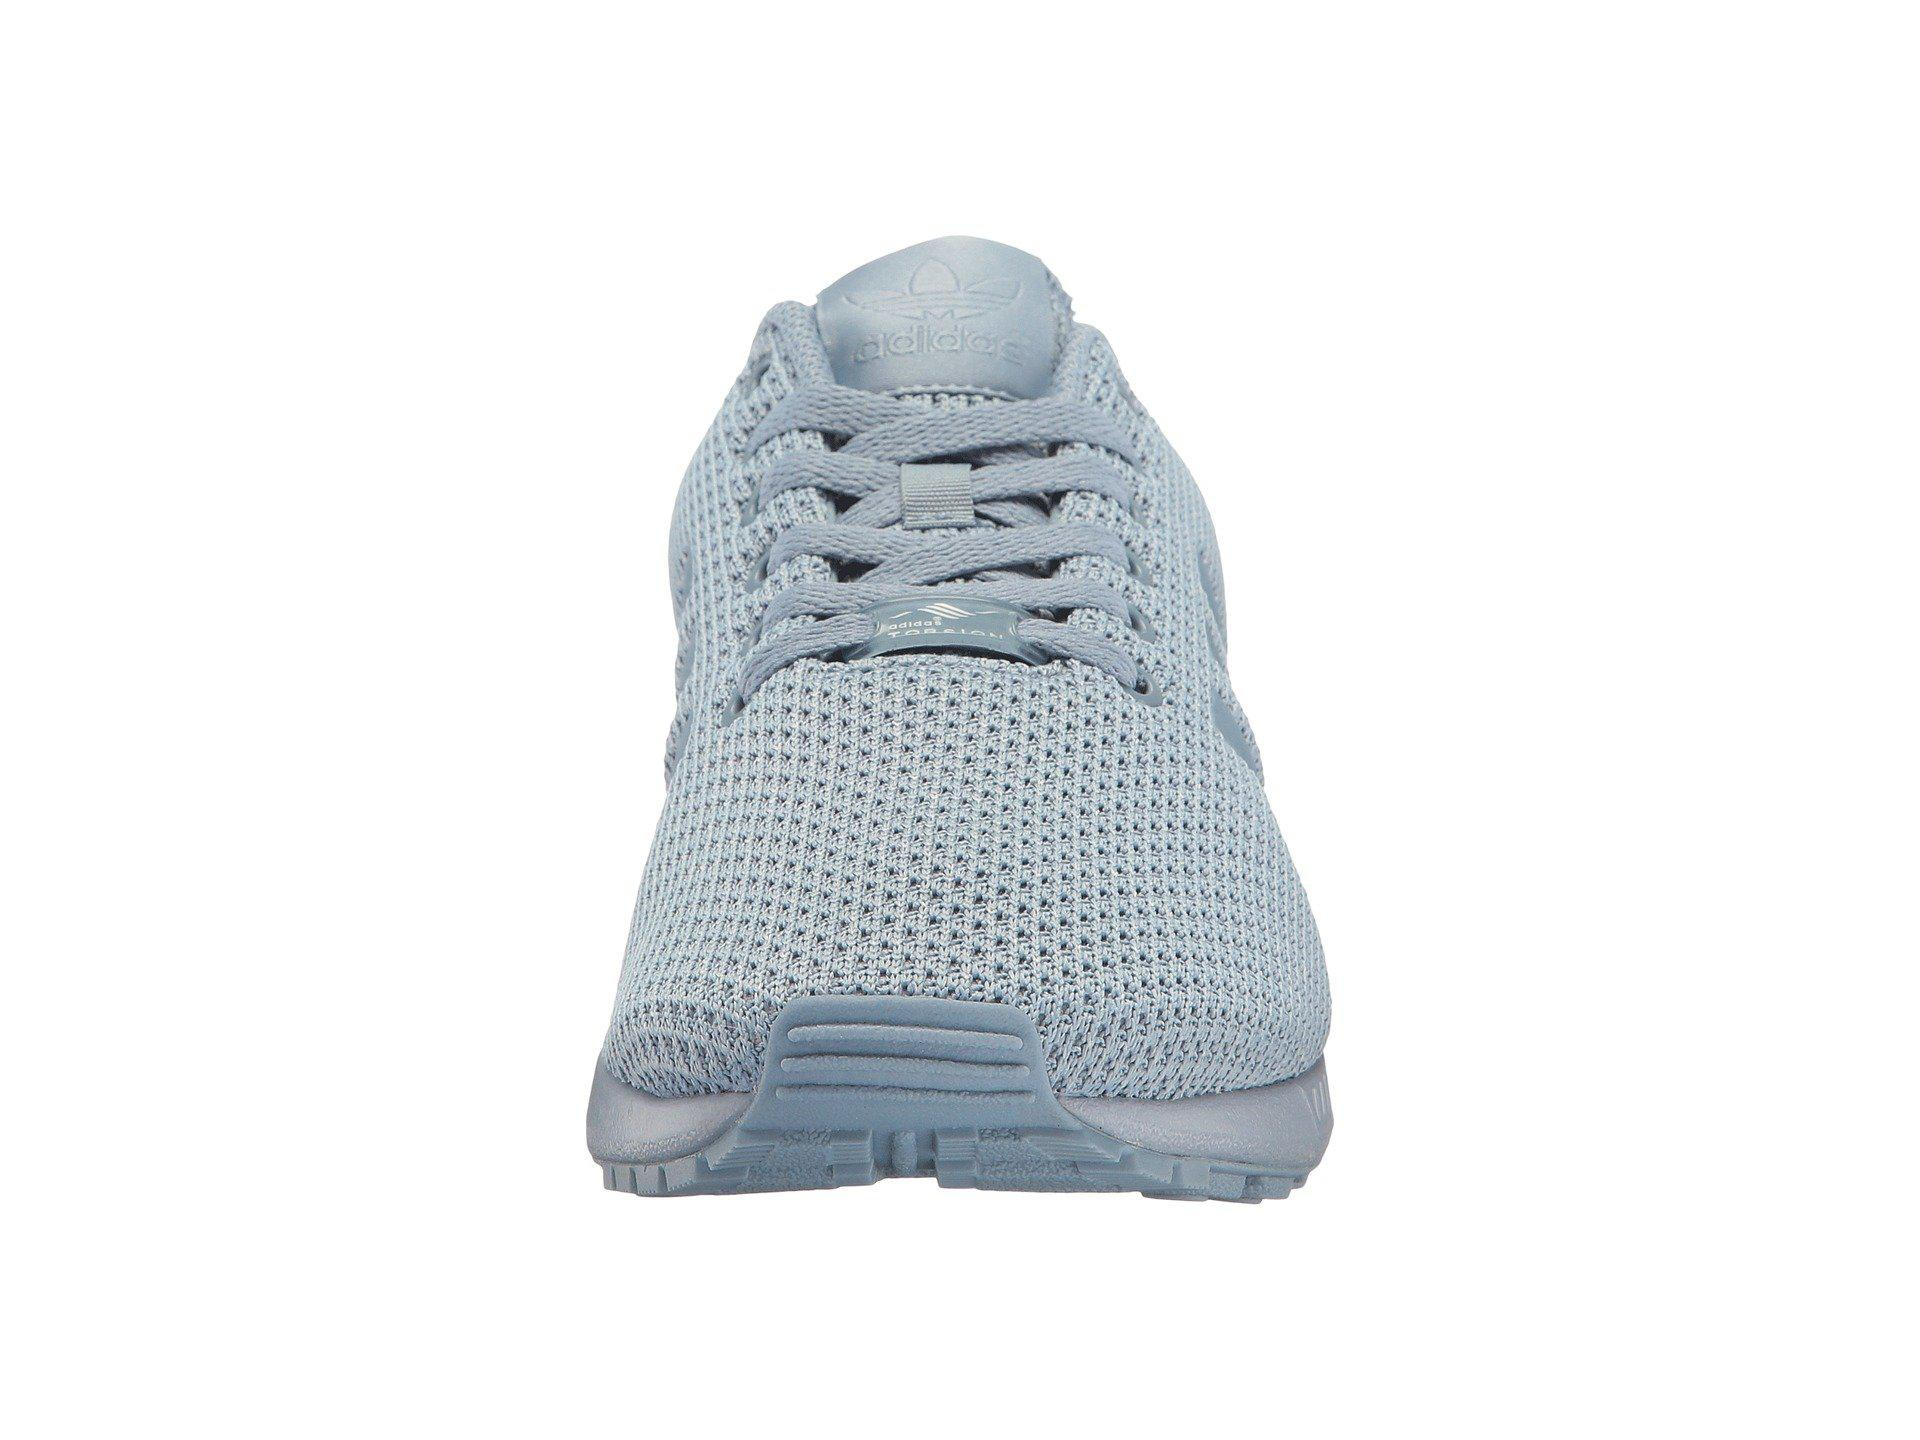 681184c4ea02 Lyst - adidas Originals Zx Flux - Clima Pastels in Blue for Men